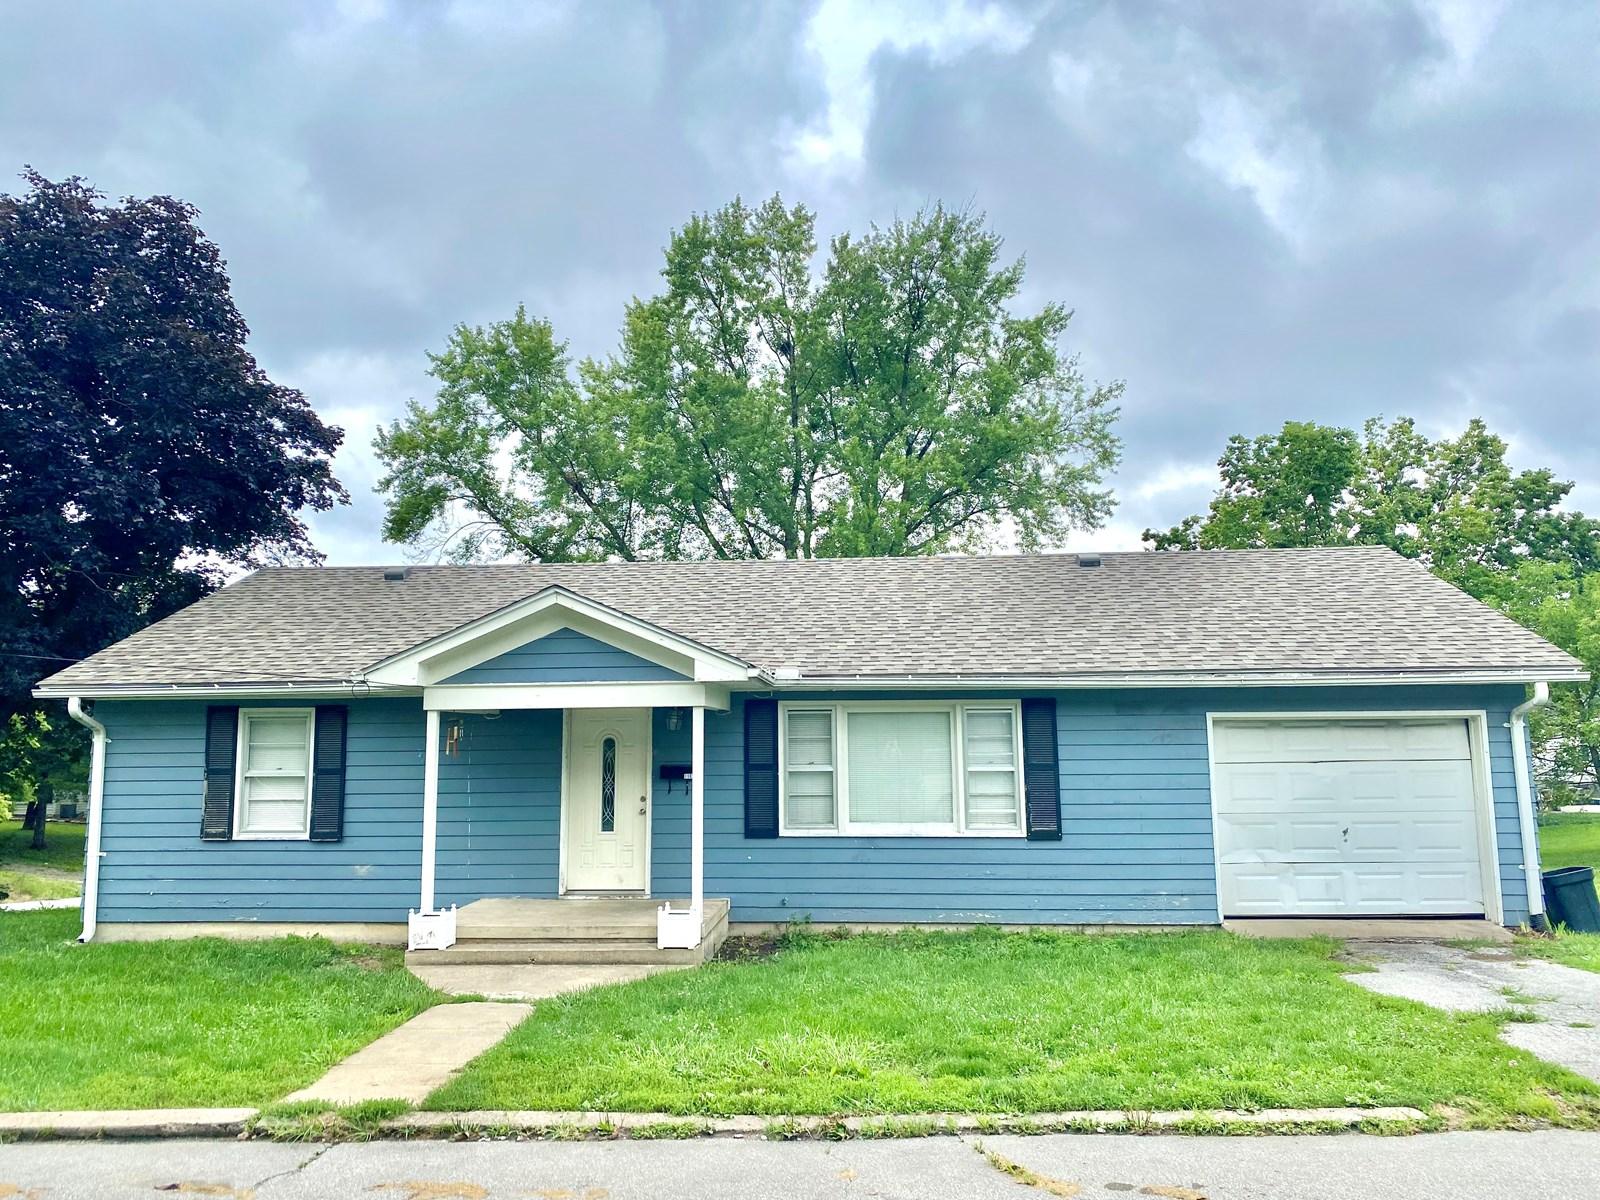 For Sale Ranch Home in Trenton Missouri